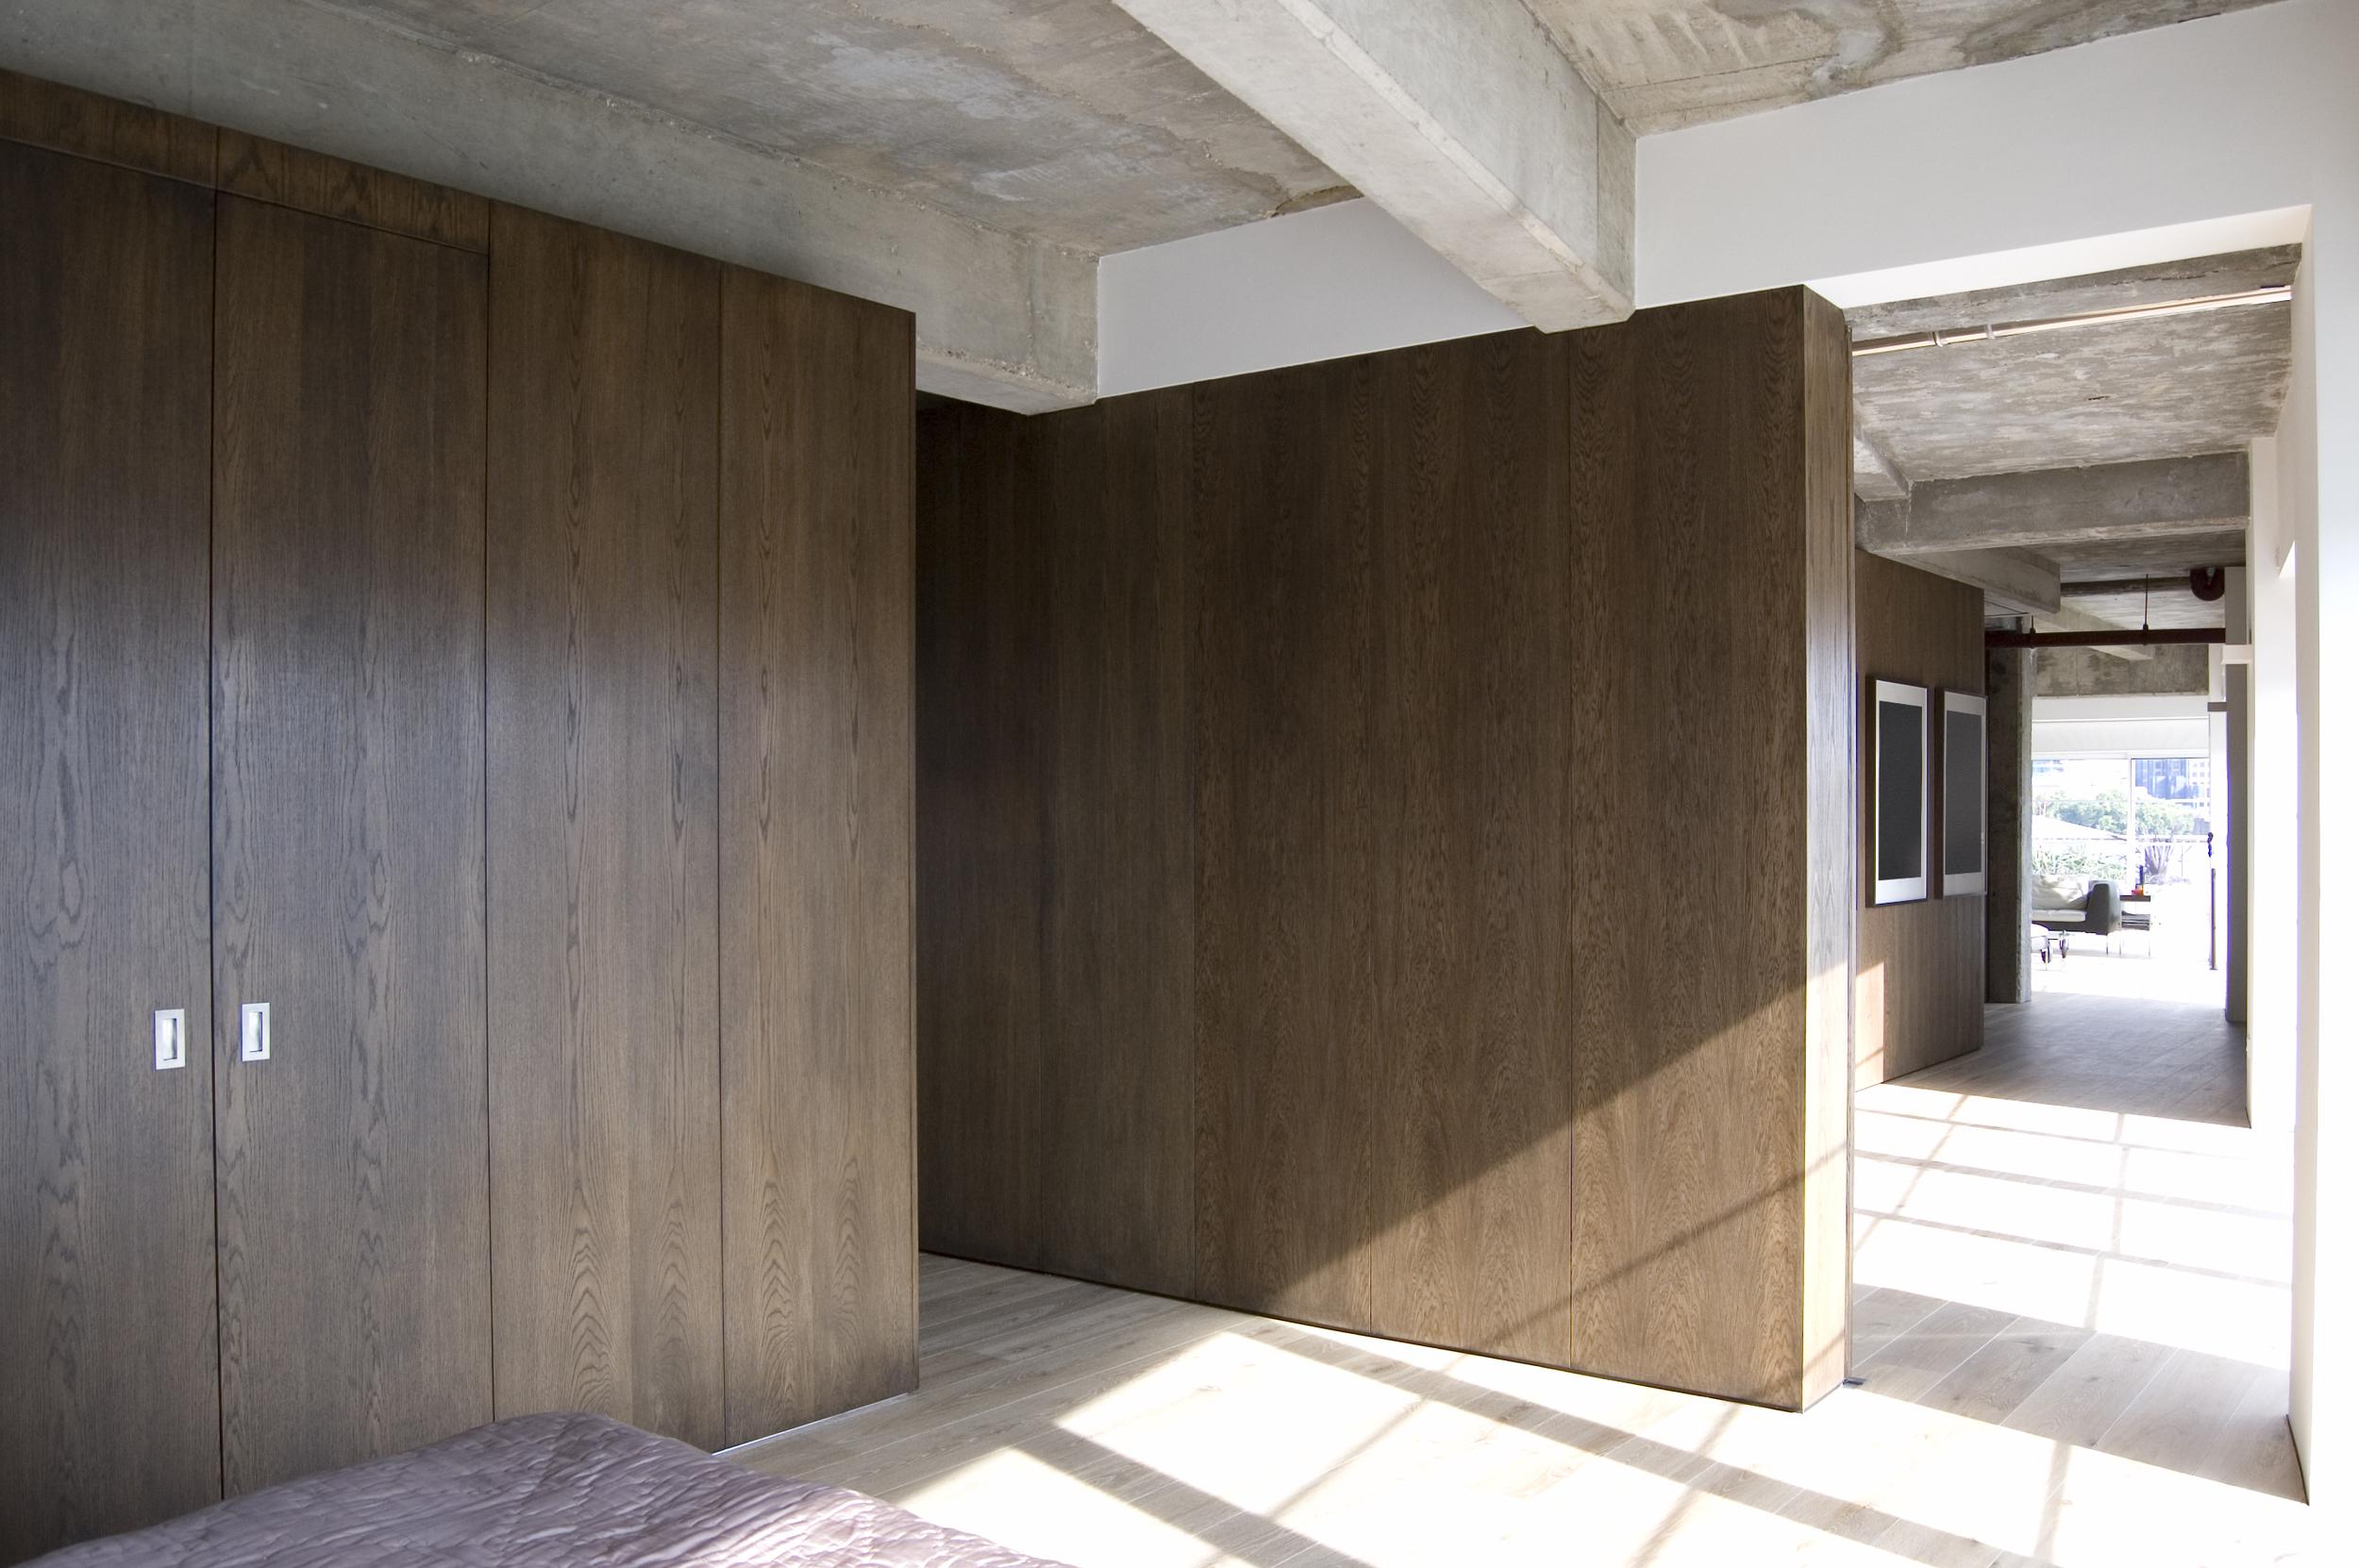 WTAD_horizontal_house_06.jpg